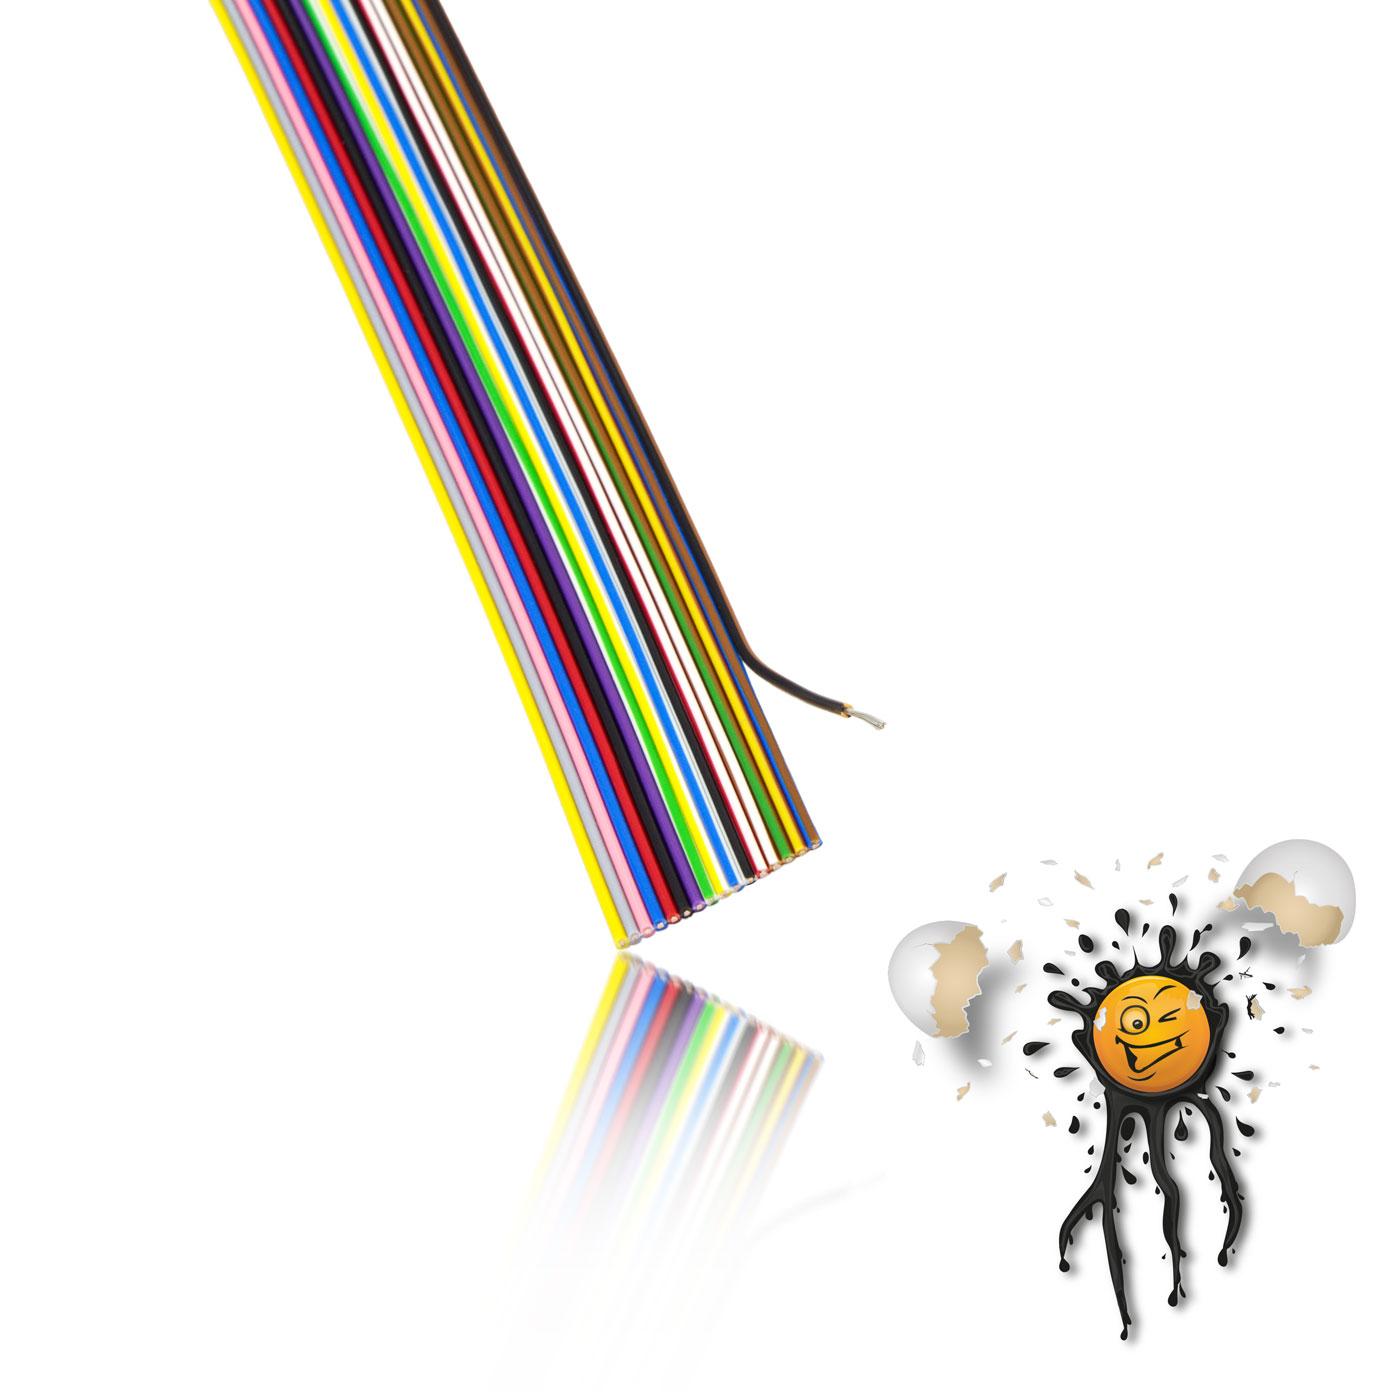 Detail Flachbandkabel AWG27 17-polig